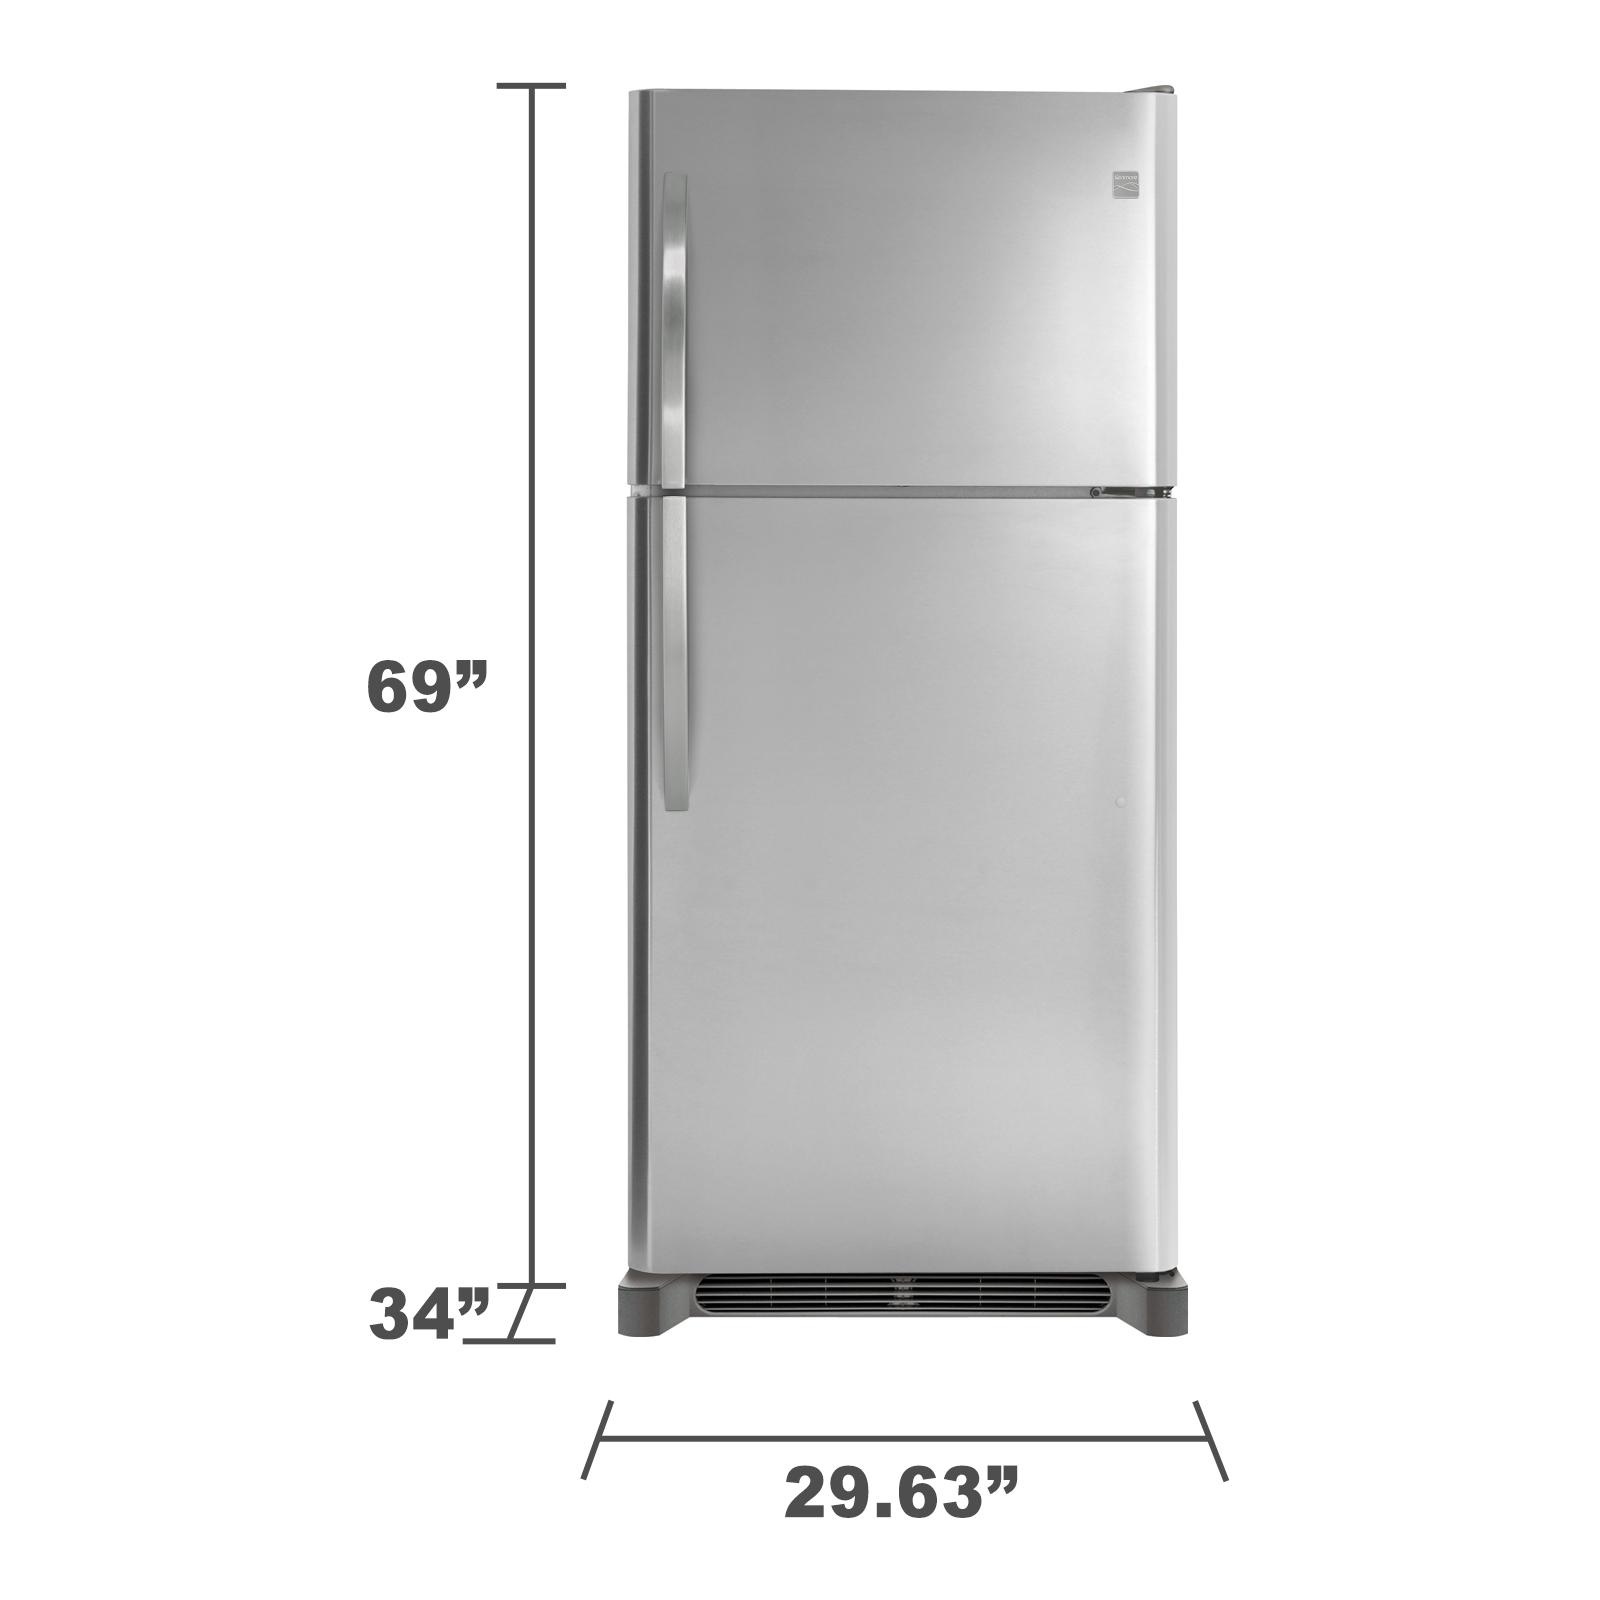 Kenmore 60623 20.4 cu. ft. Top Freezer Refrigerator - Stainless Steel